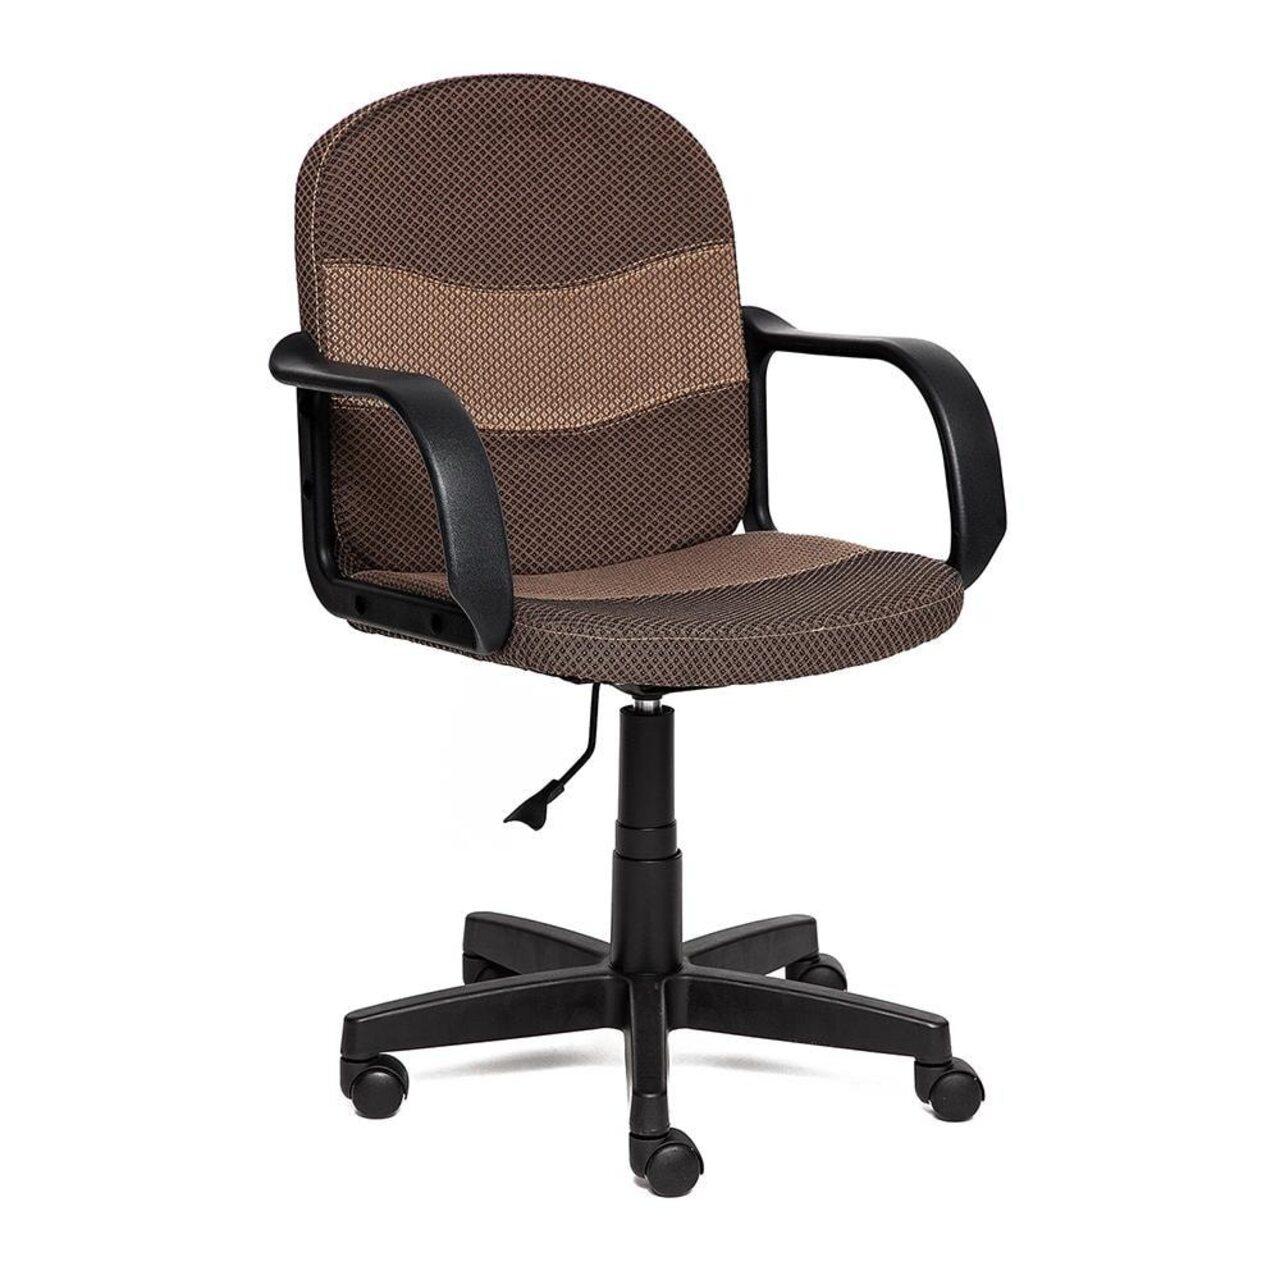 Кресло для персонала BAGGI (ткань) - фото 5